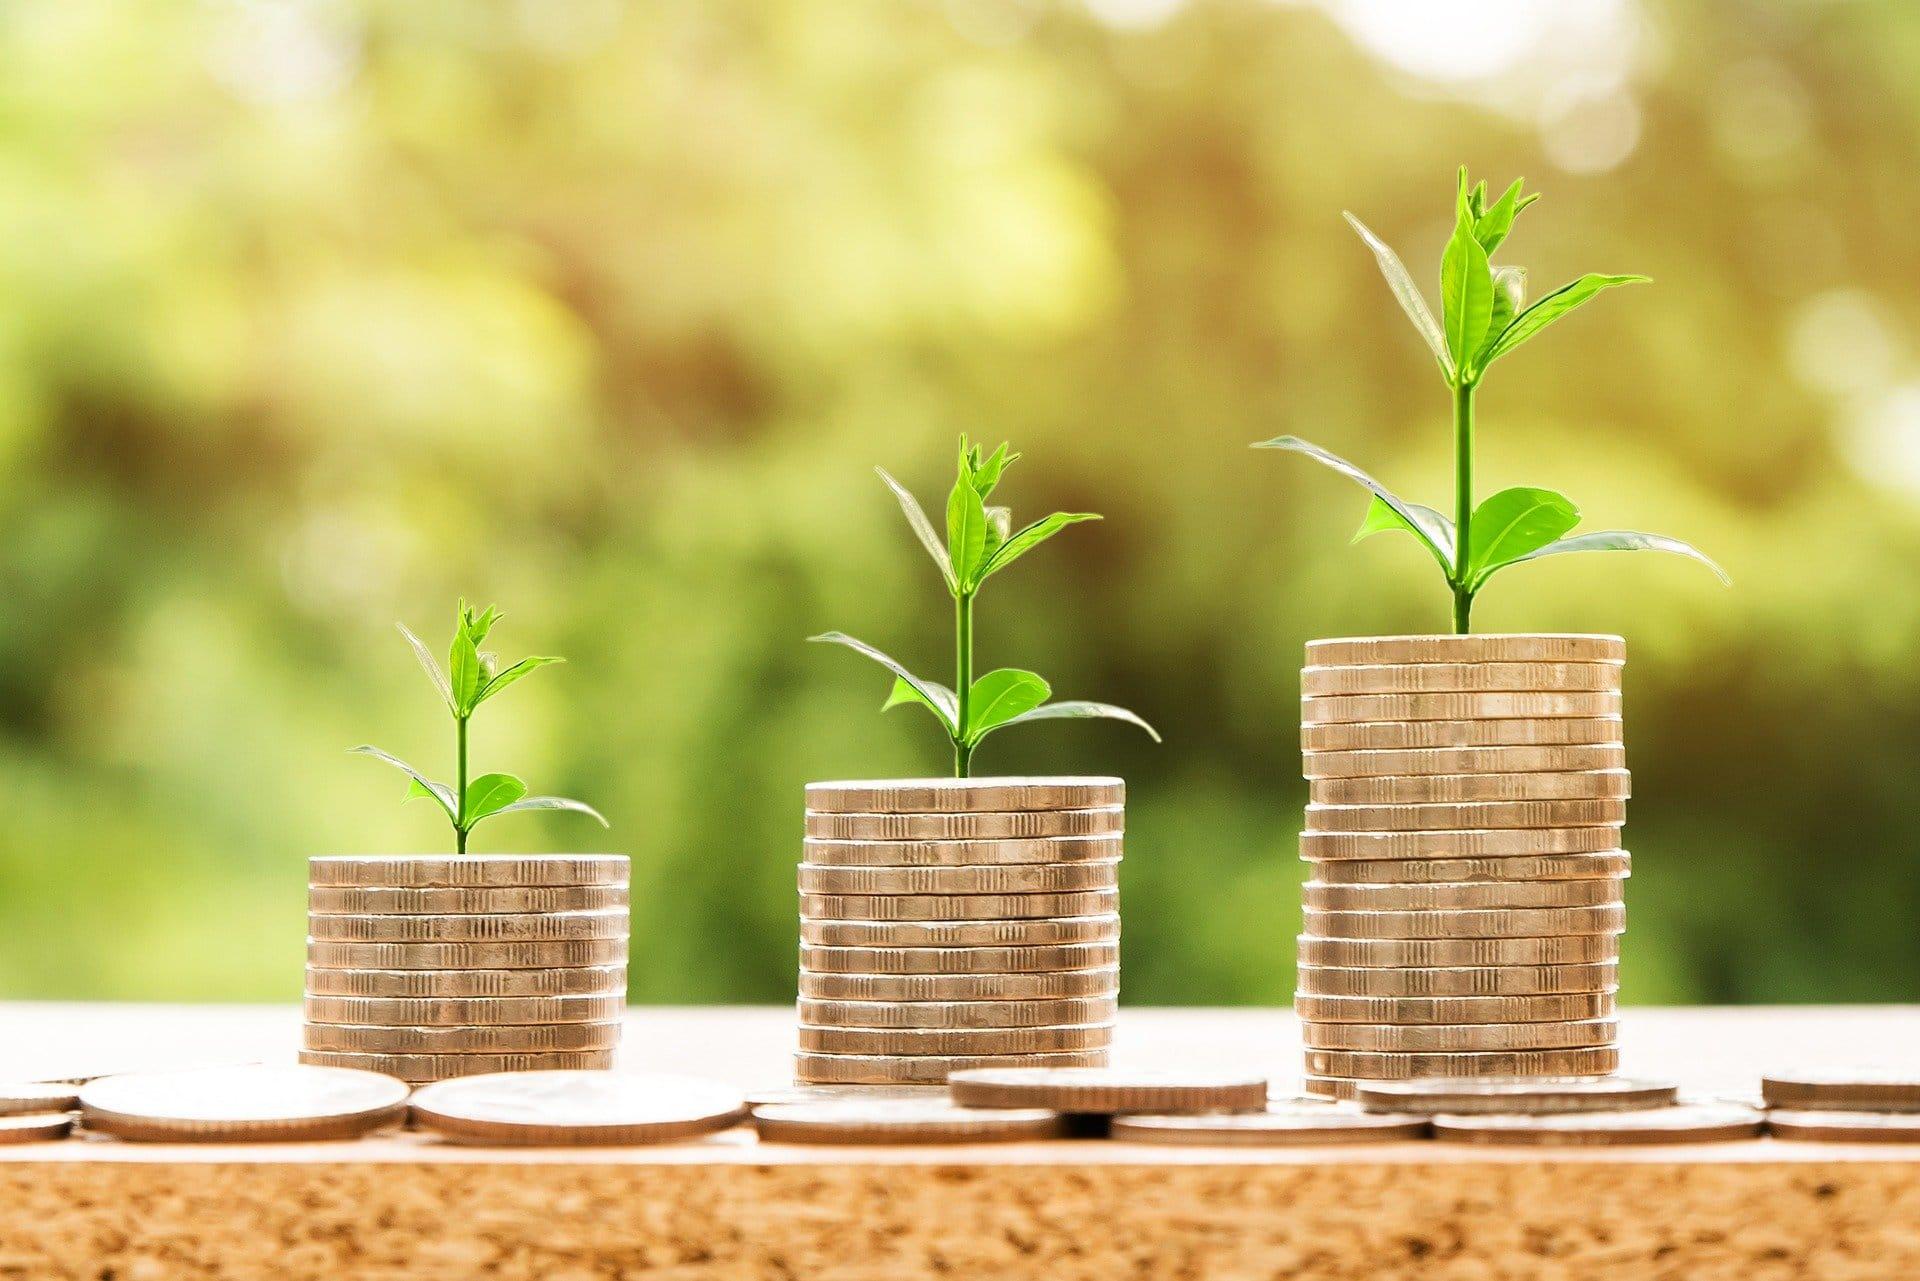 Kovanci, rastline, rast. Vir: Pixabay